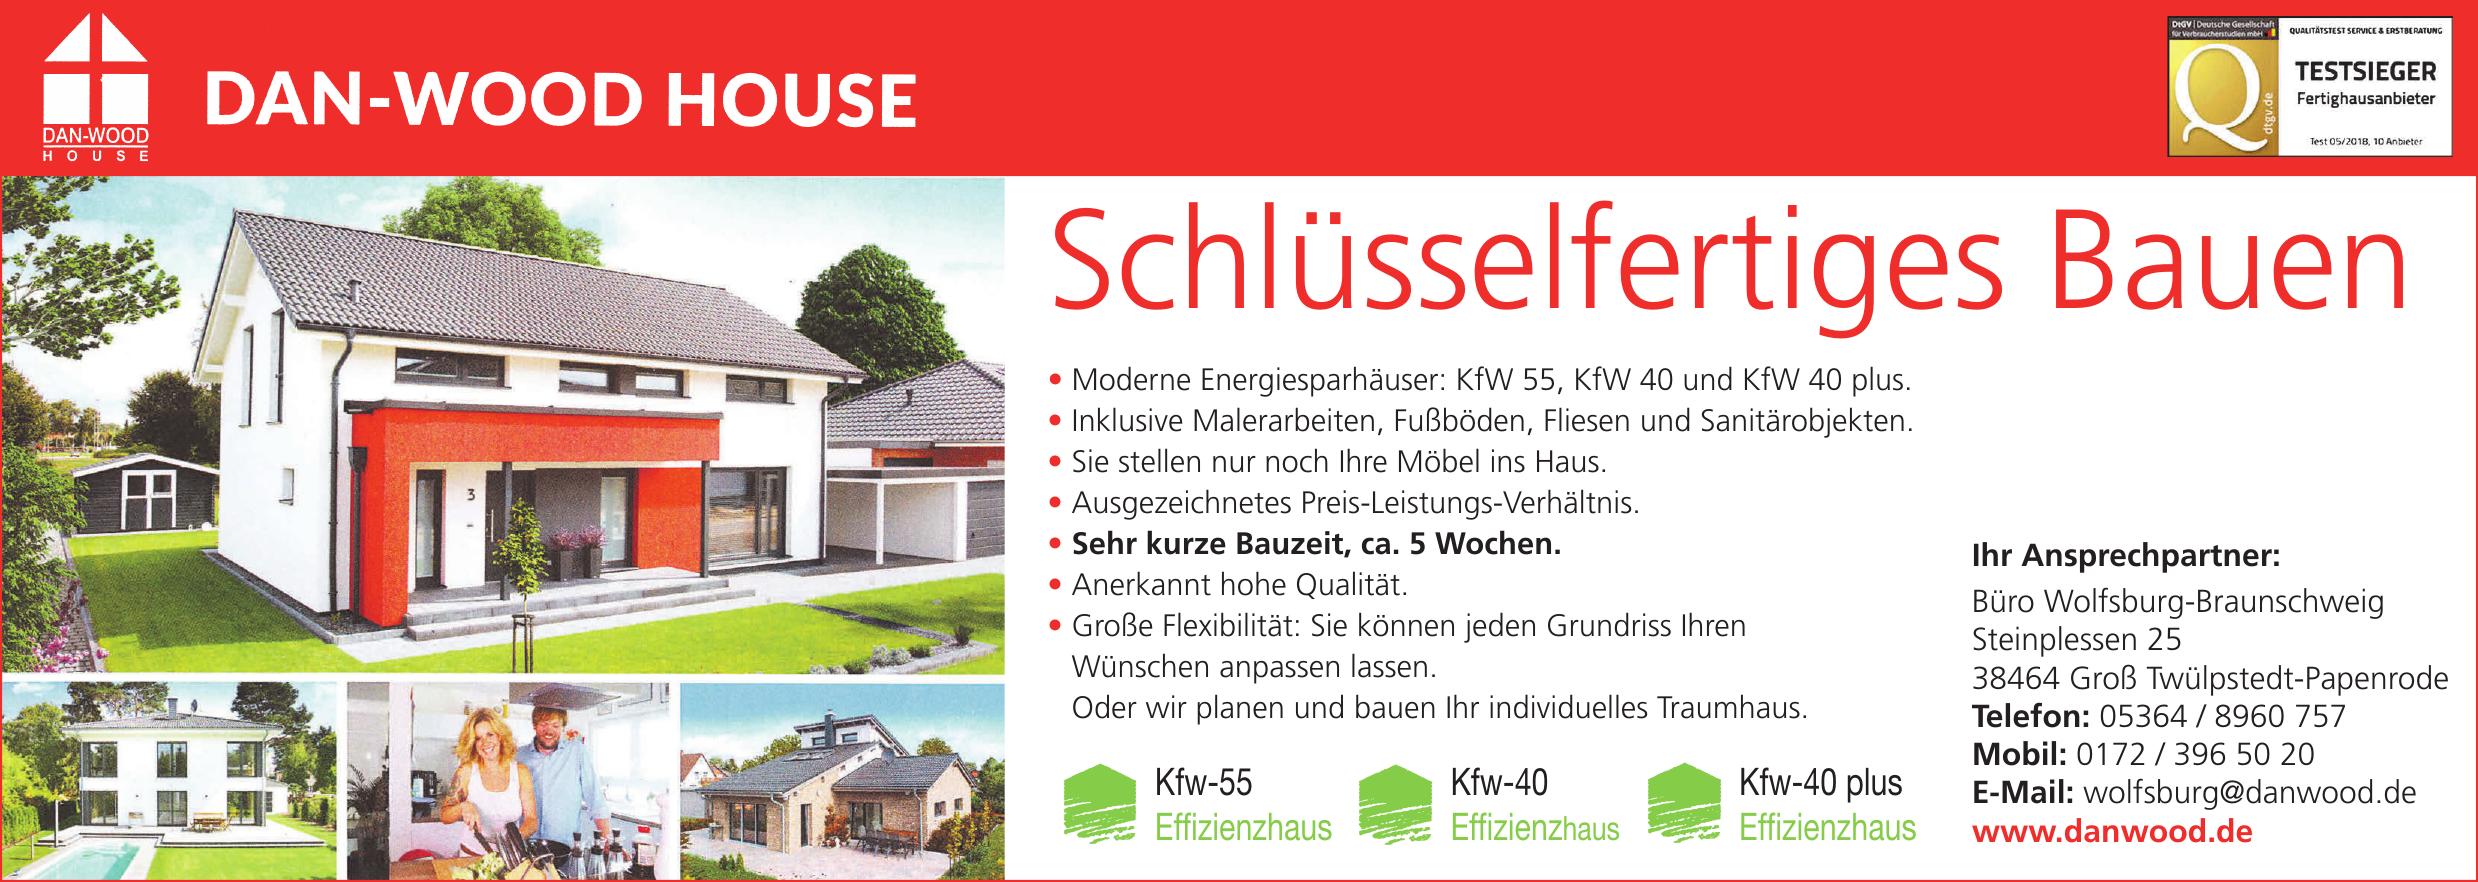 Dan-Wood House